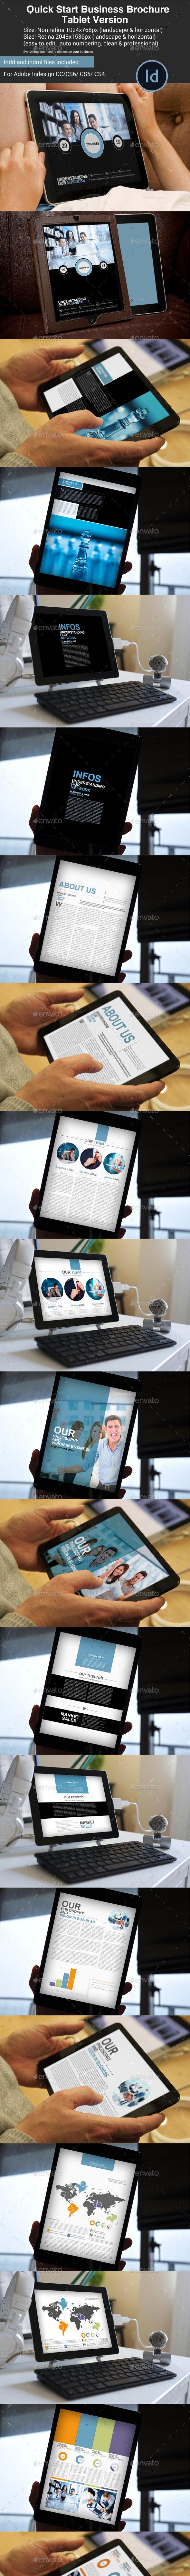 Quick Start Business Brochure Tablet Version - Digital Books ePublishing